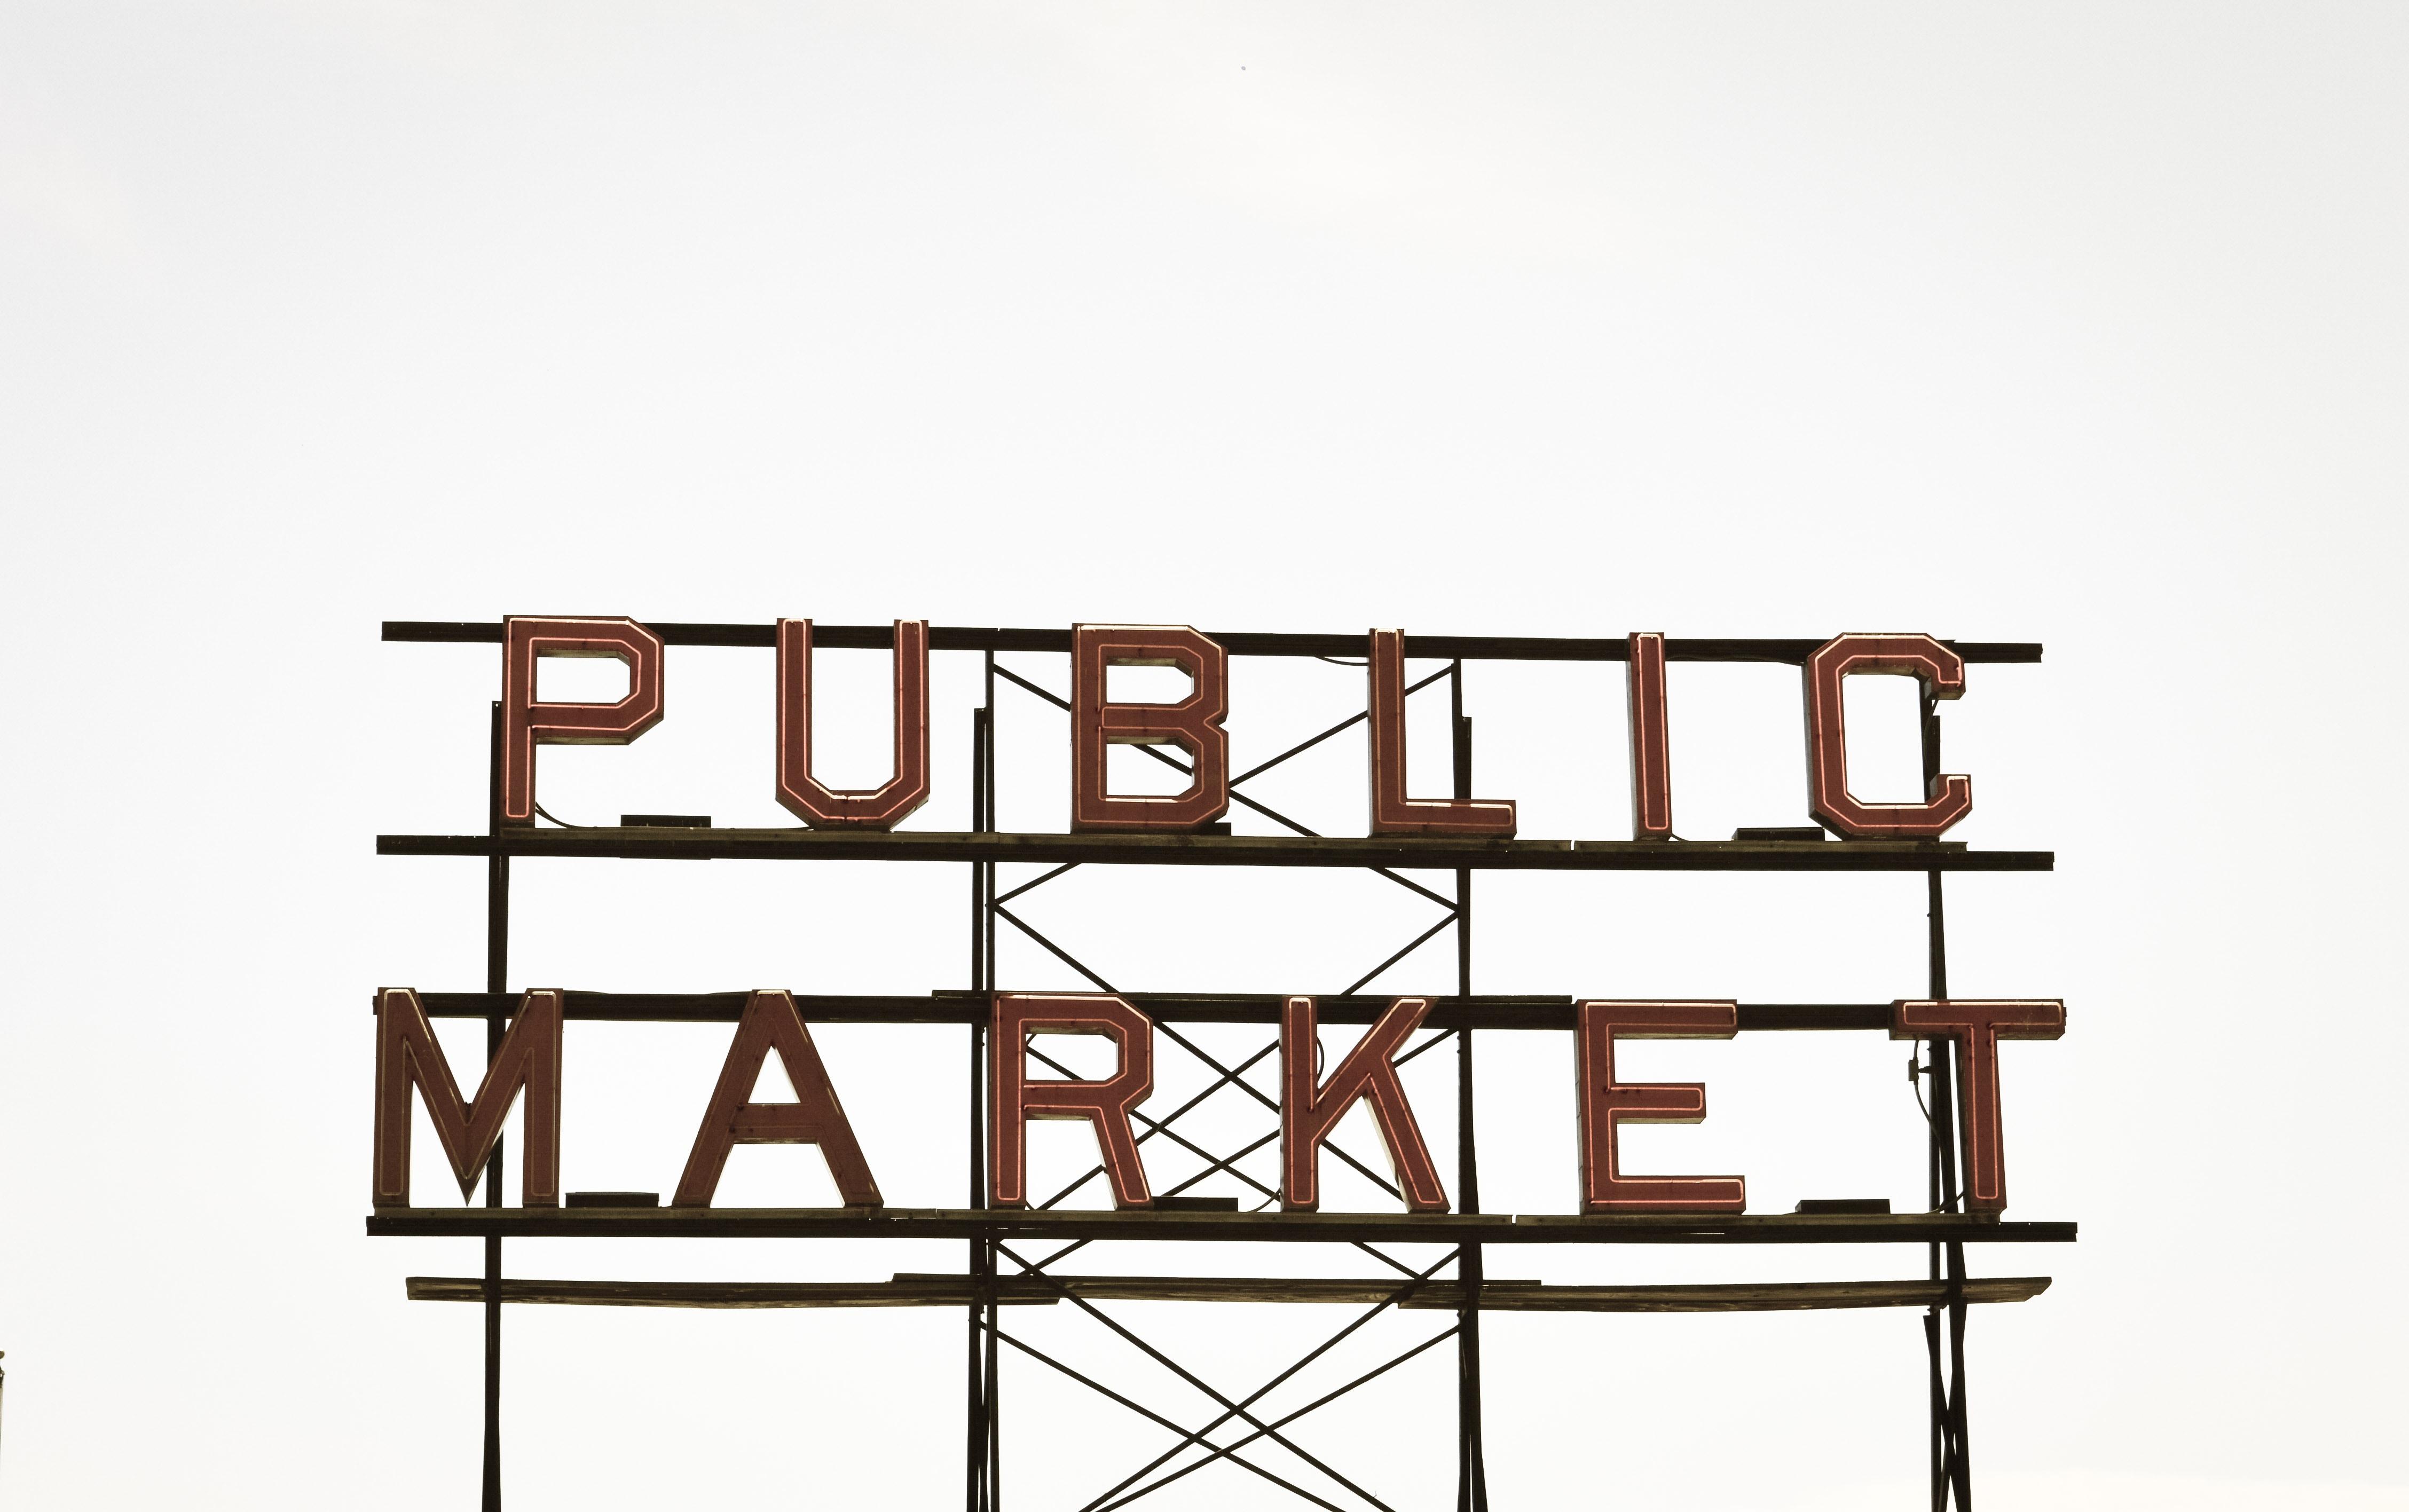 Elenco dei marketplace b2b globali